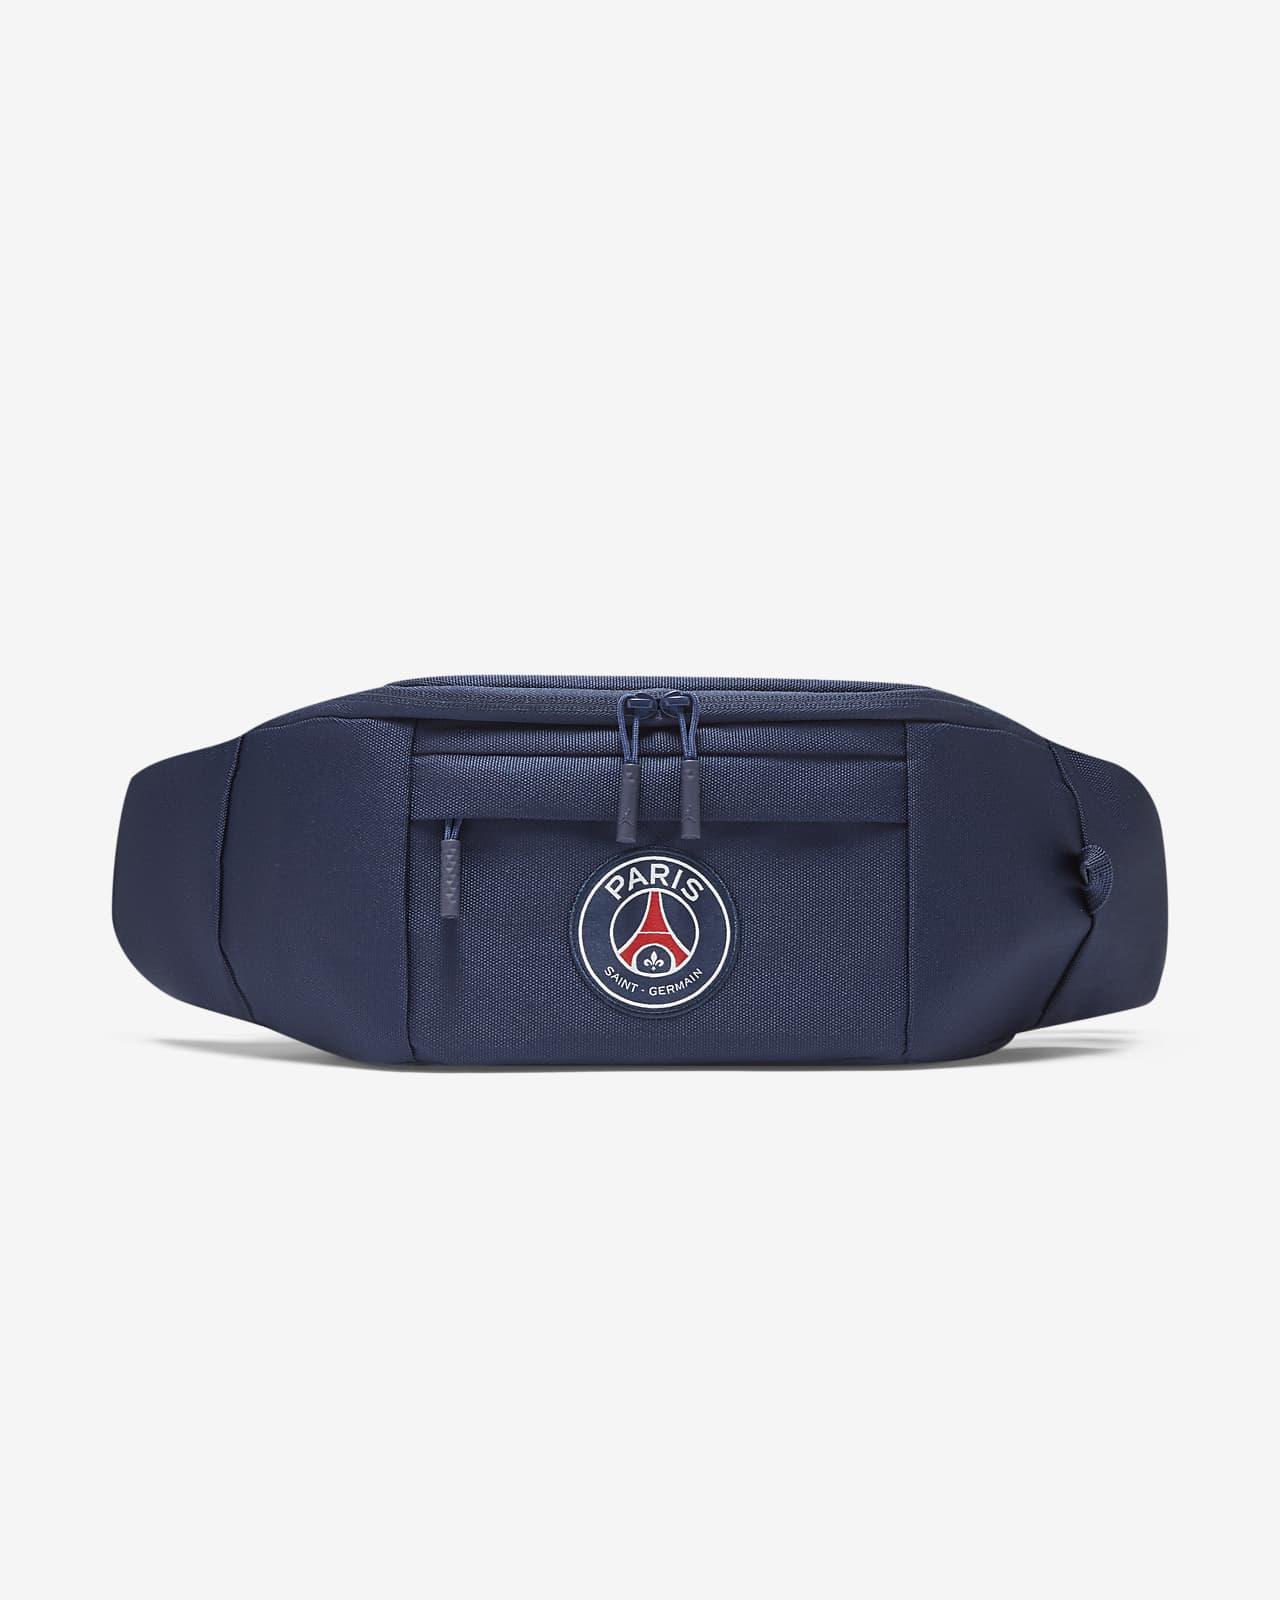 Paris Saint-Germain Cross-Body Bag